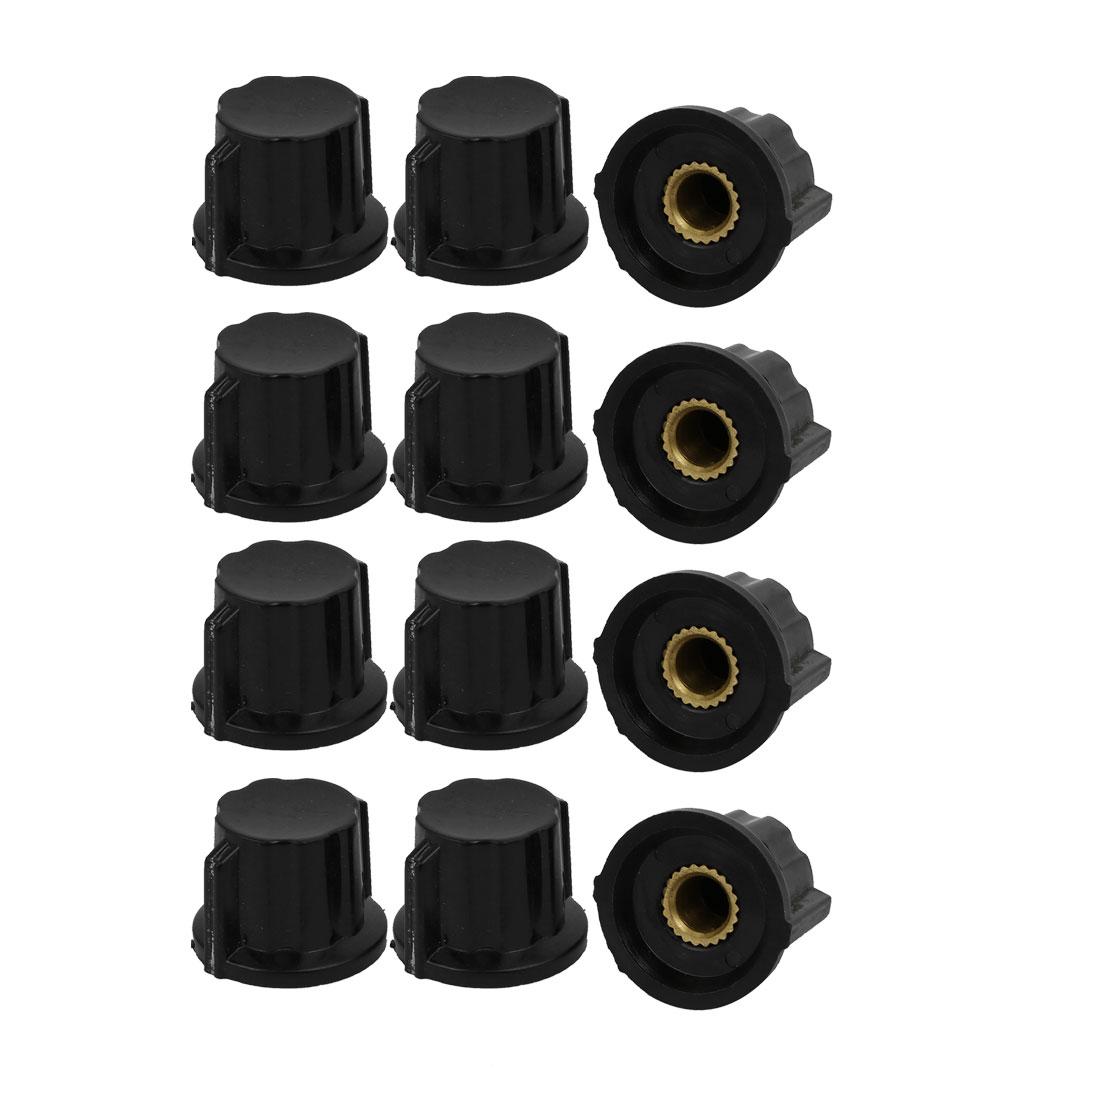 6mm Plastic Rotary Potentiometer Volume Control Knob Cover Cap Black 12pcs